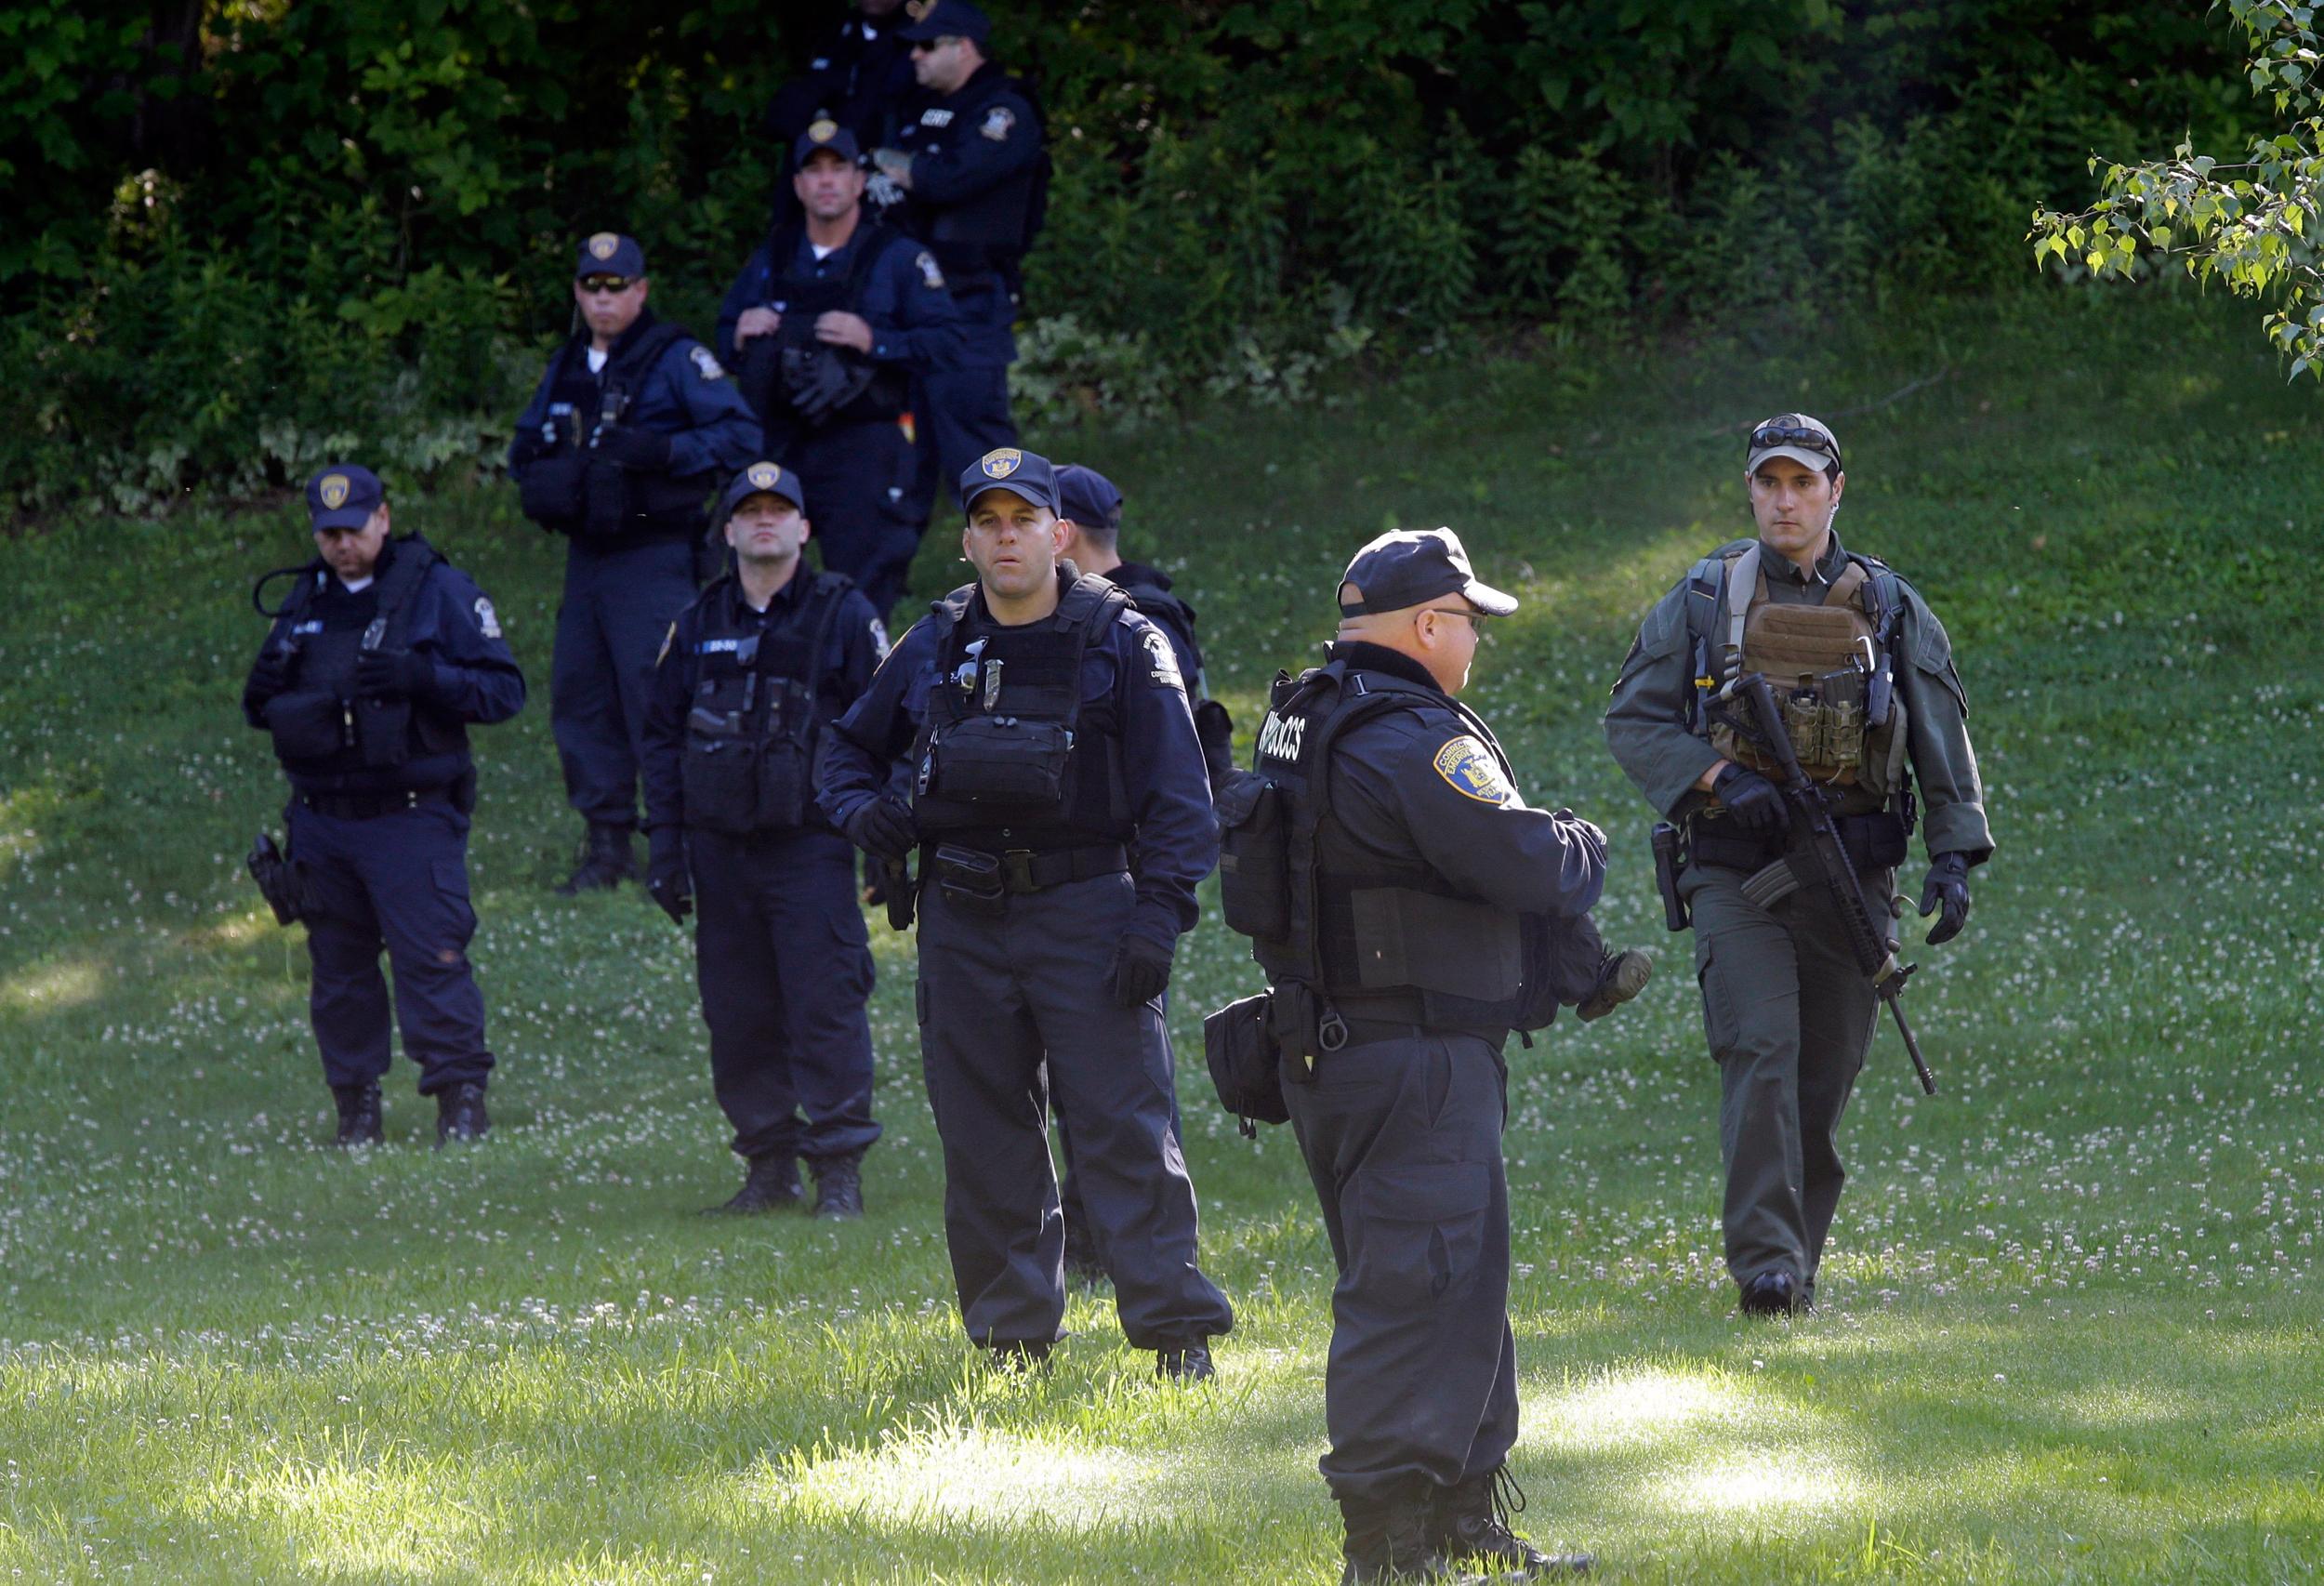 Escaped Killer Richard Matt Shot Dead by Officer, Other